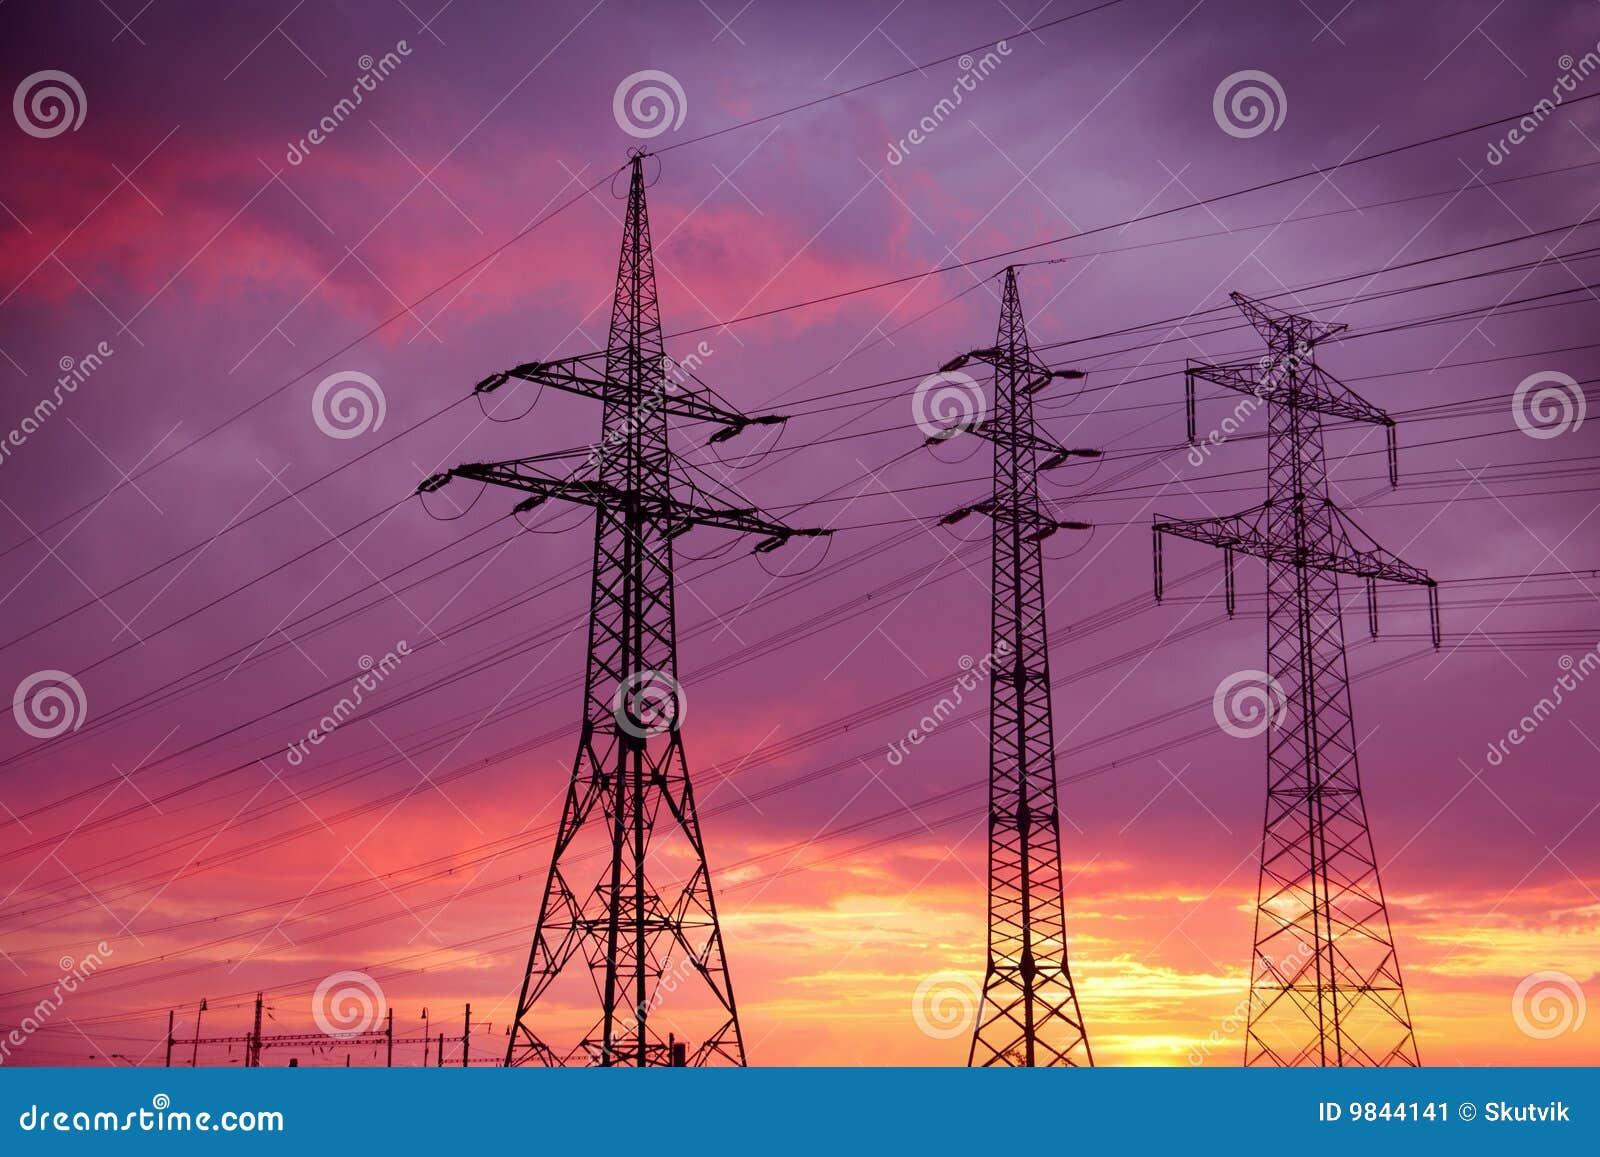 Líneas eléctricas de alto voltaje